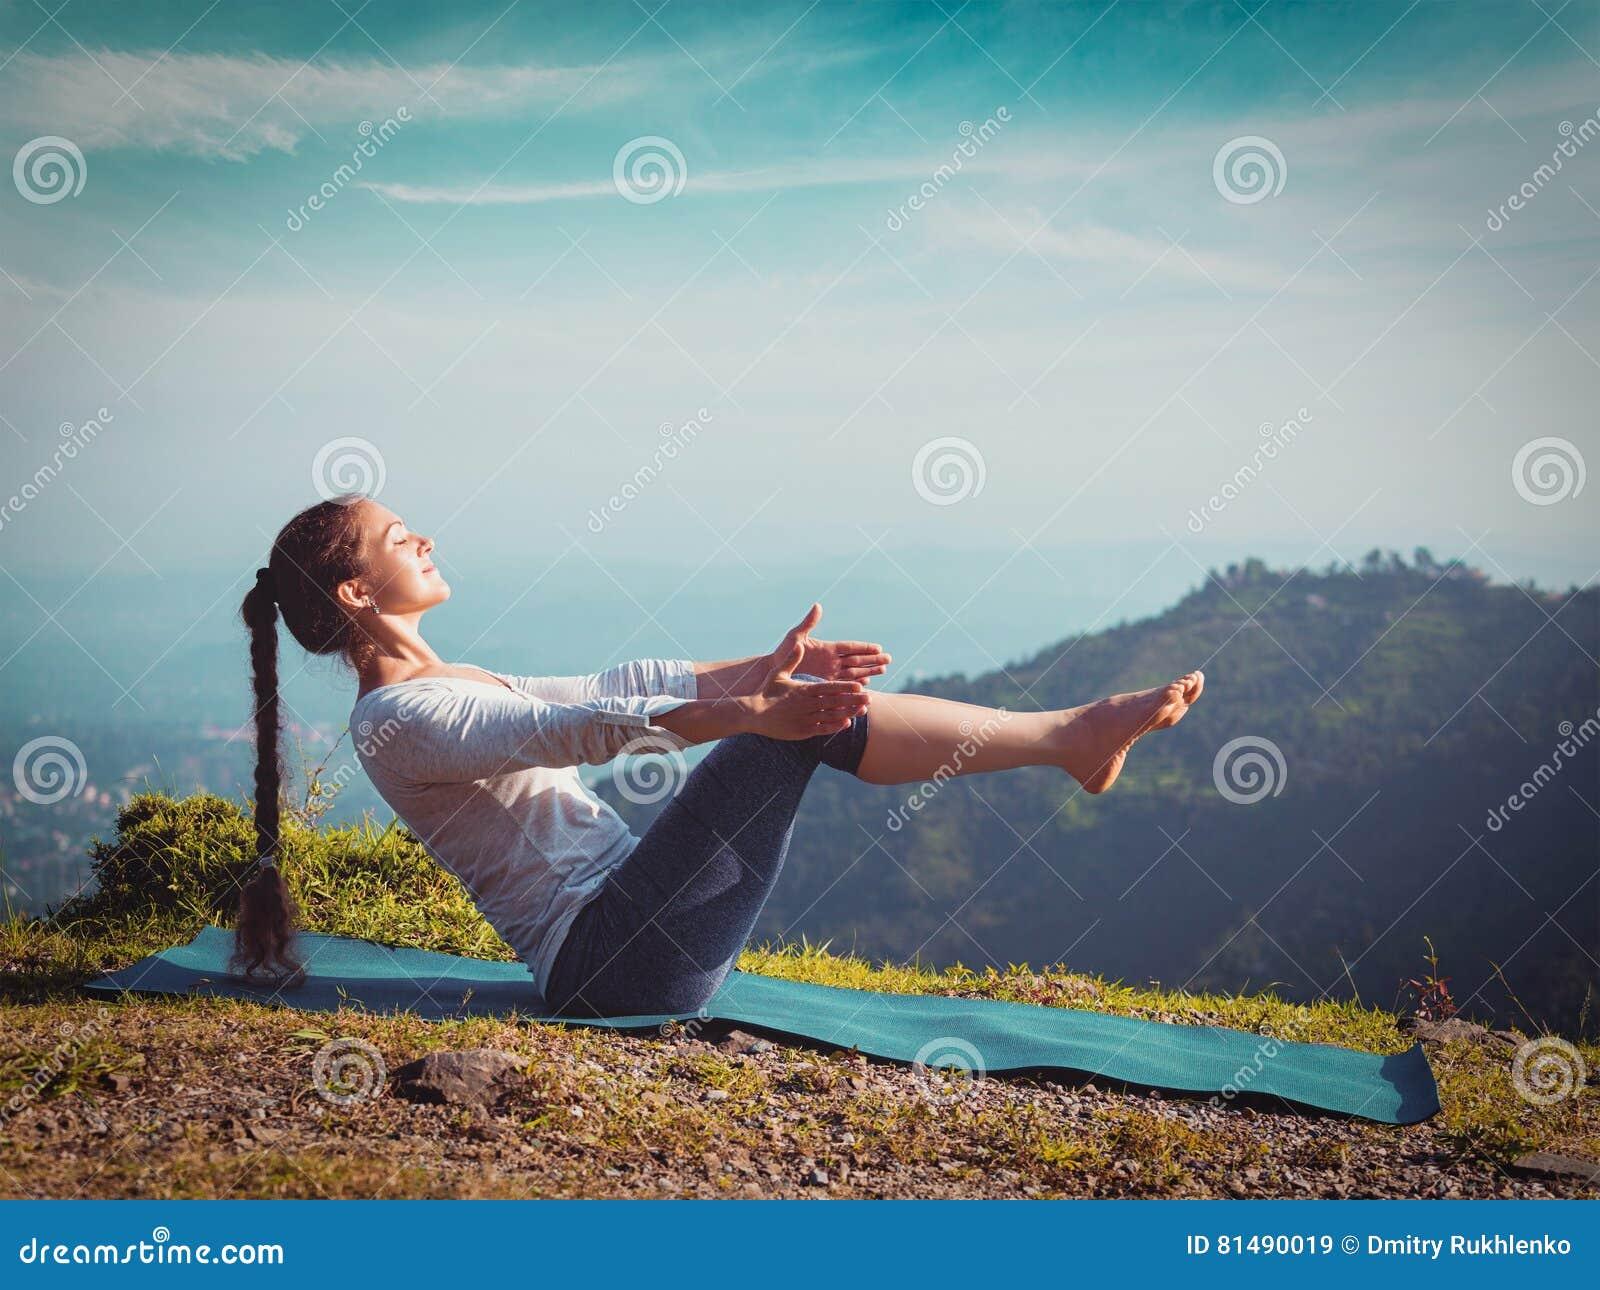 Woman Doing Ashtanga Vinyasa Yoga Asana Navasana - Boat ...